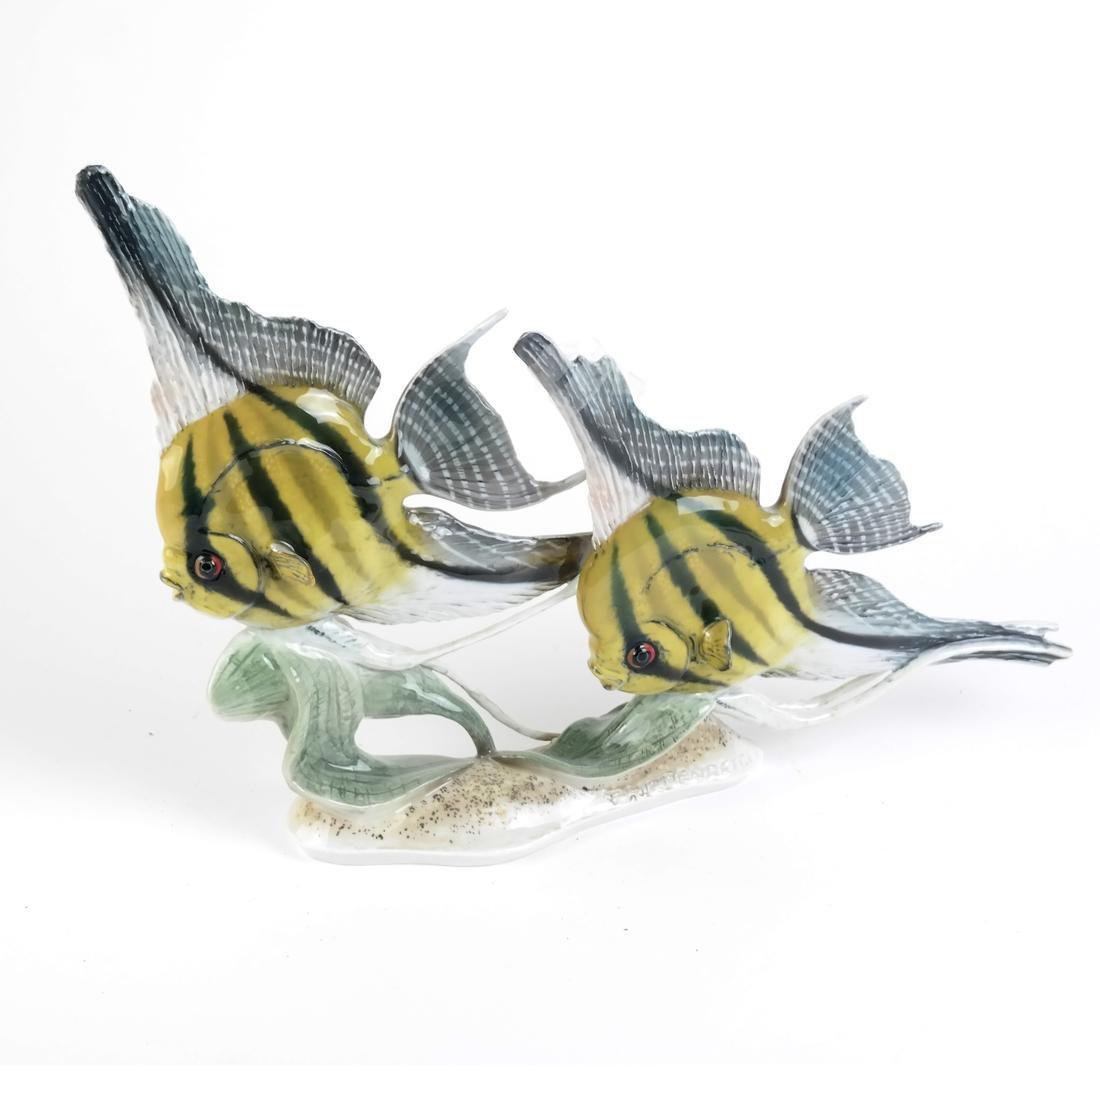 Rosenthal Fish Sculpture